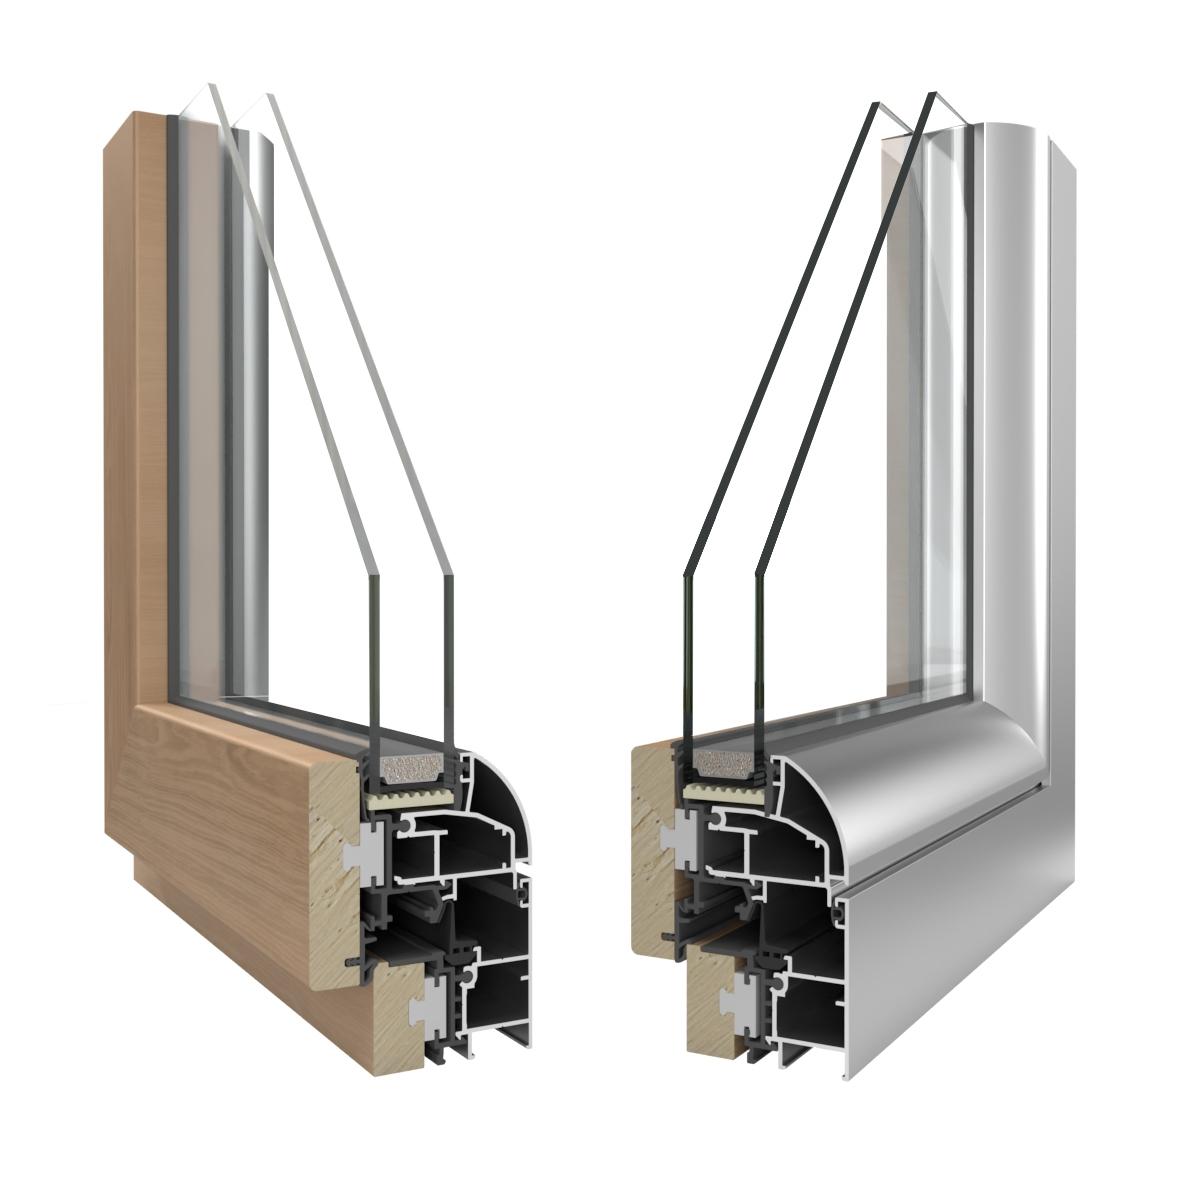 https://www.allpaint.it/wp-content/uploads/2021/07/finestre-alluminio-legno-woodlinett-allpaint.jpg